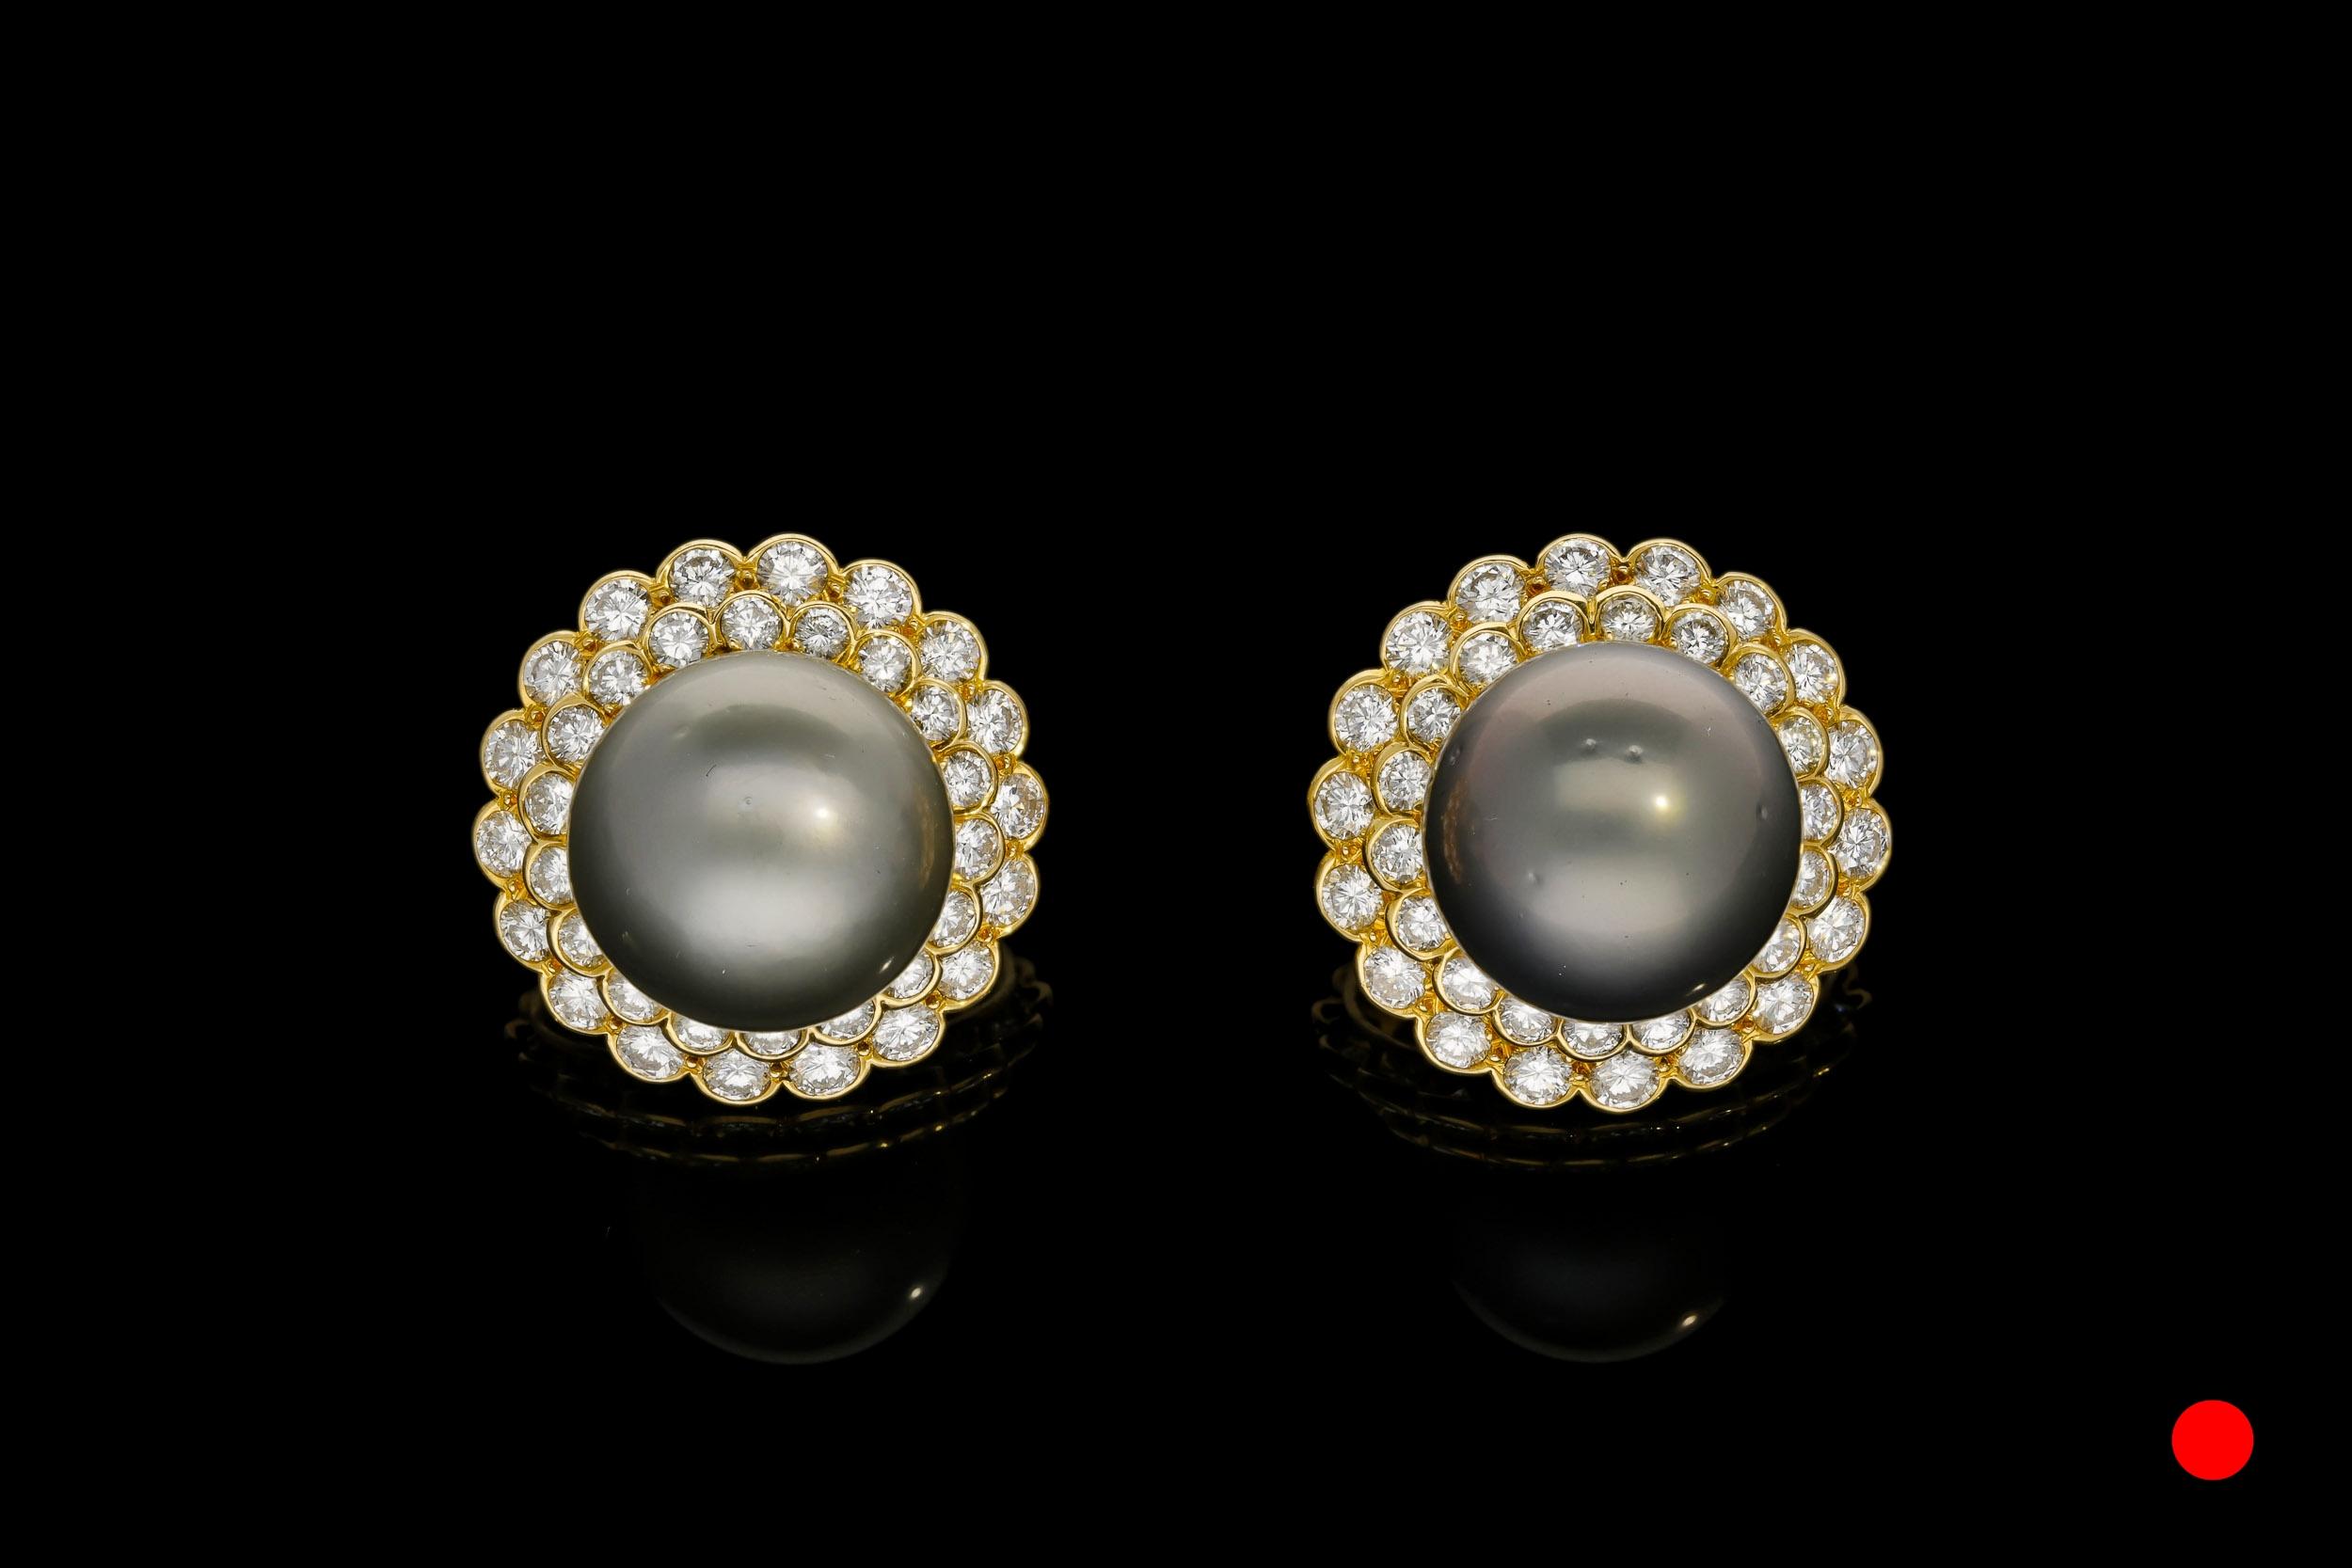 A magnificent pair of 1970's Boucheron Paris Tahitian pearl and diamond earrings set | £14850